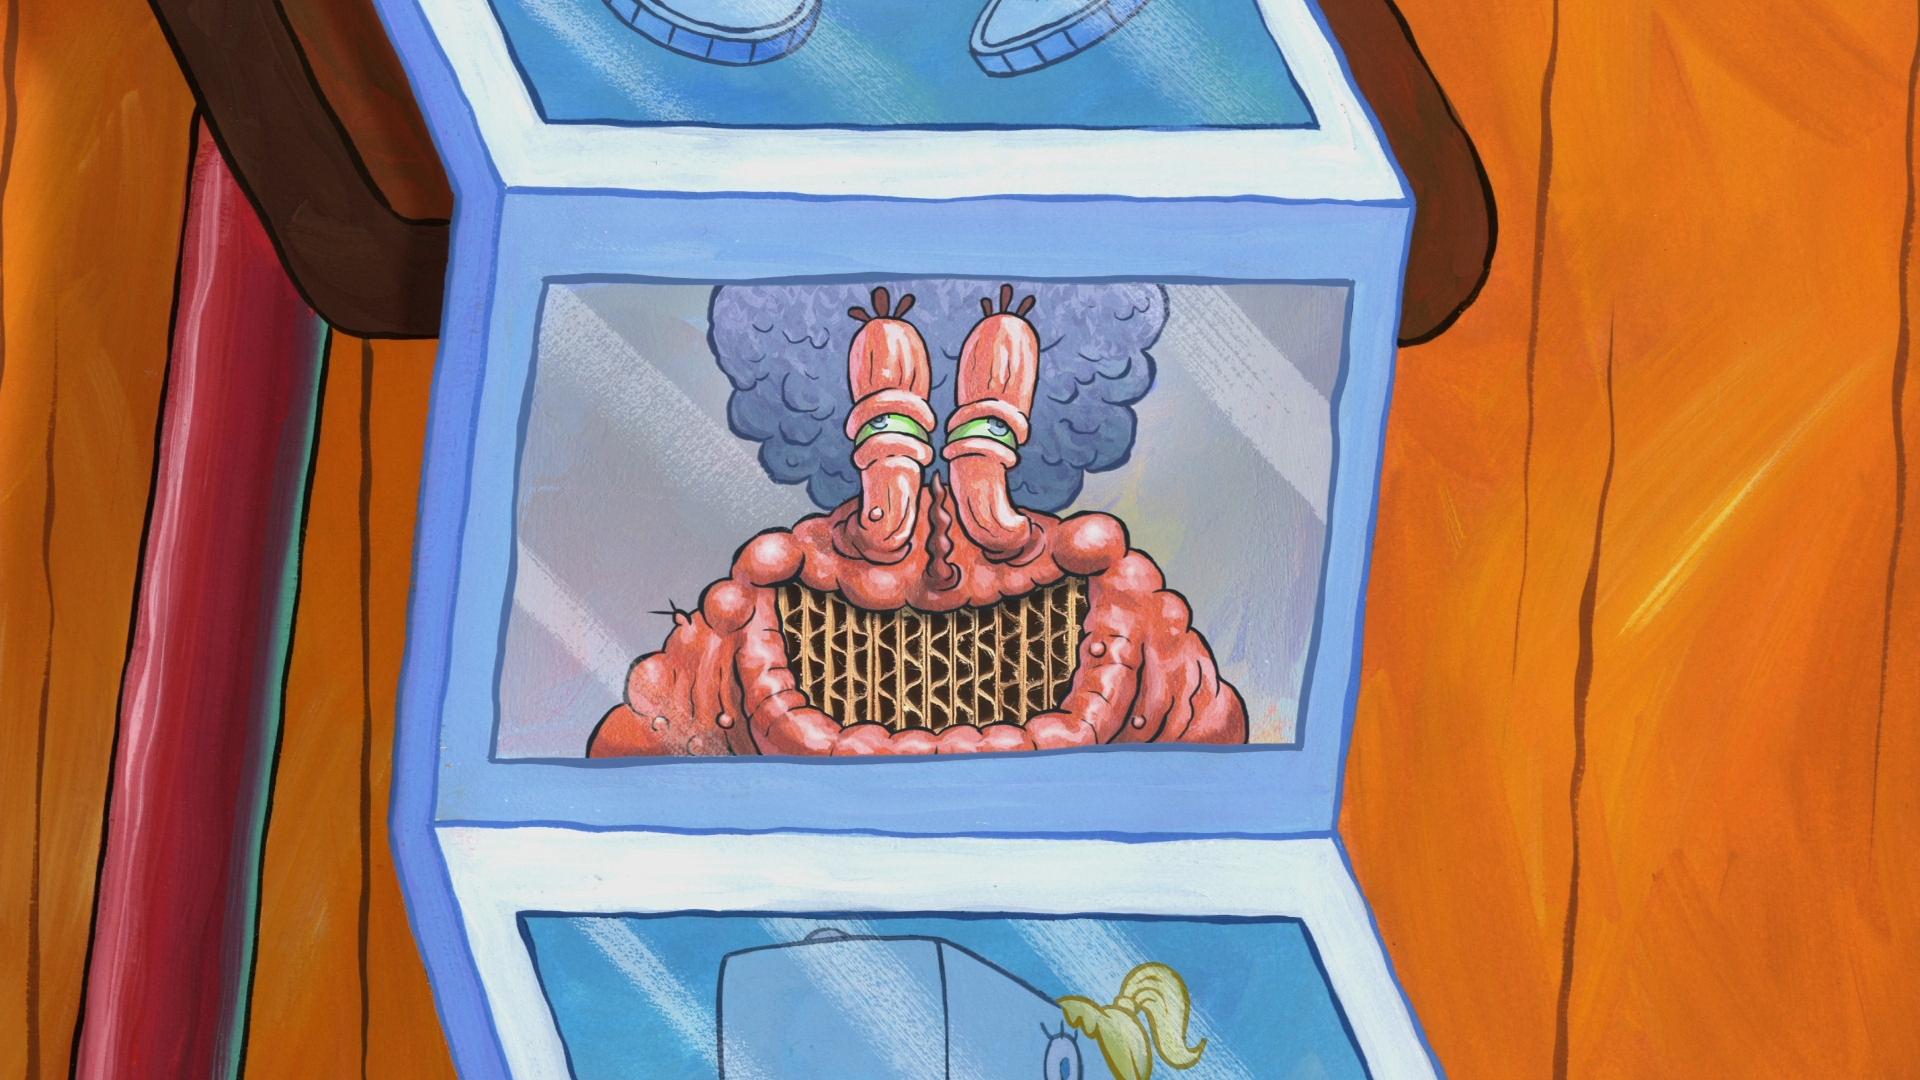 Bremmatic: Mr Krabs Daughter From Spongebob